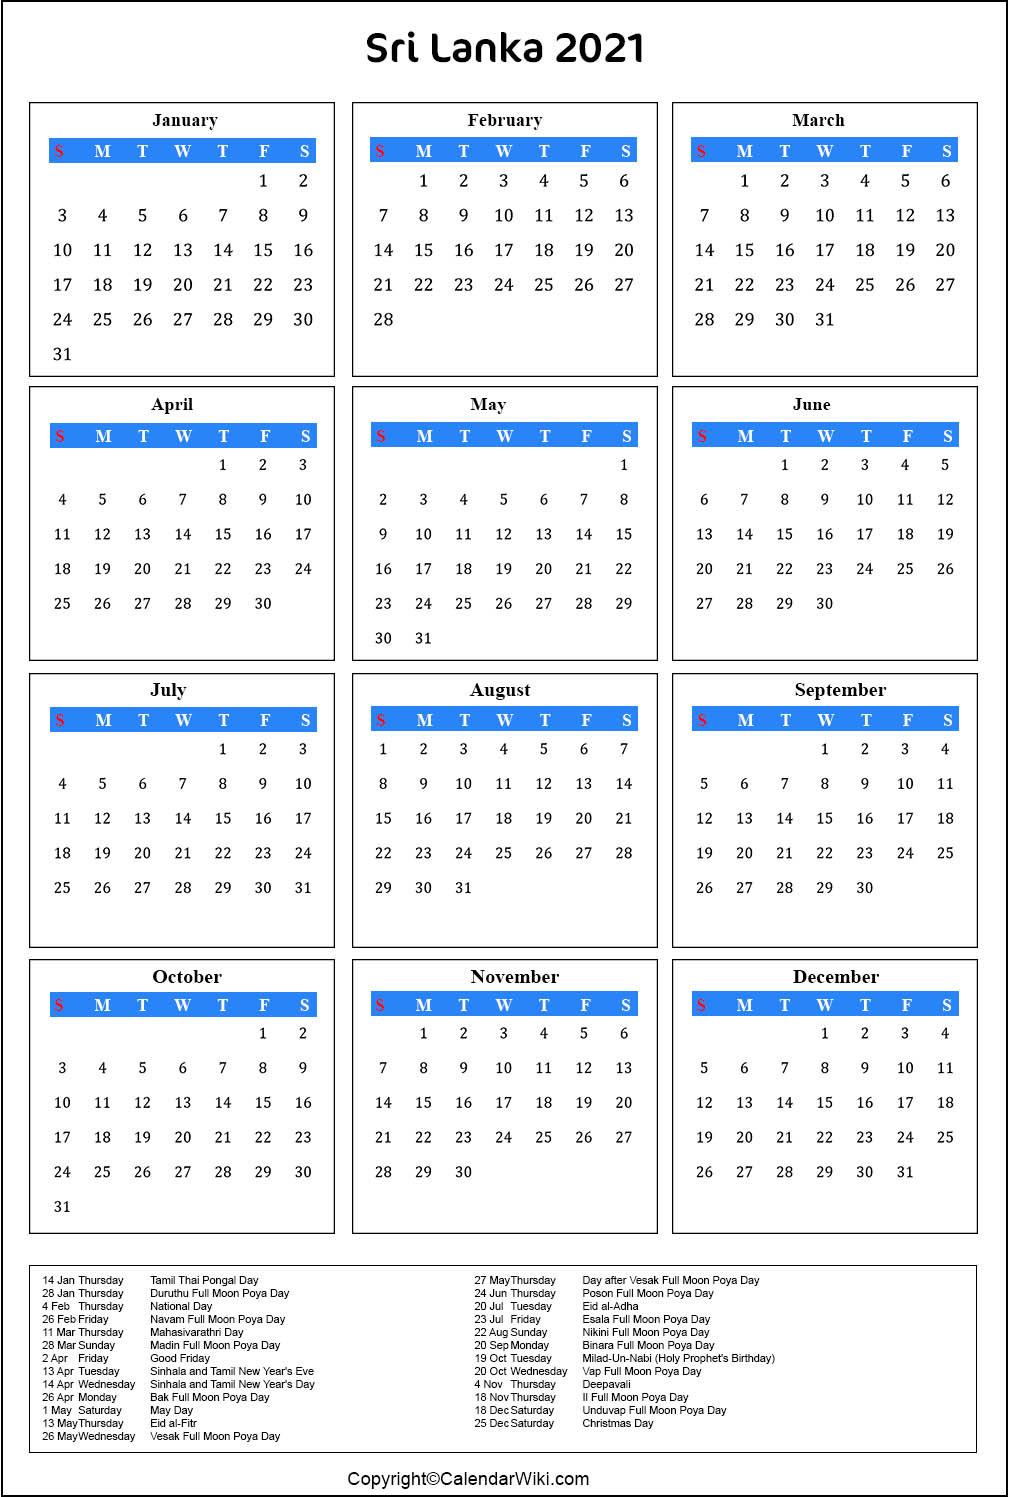 Printable Srilanka Calendar 2021 With Holidays [Public-Mercantil Holidays For 2021 Sri Lanka